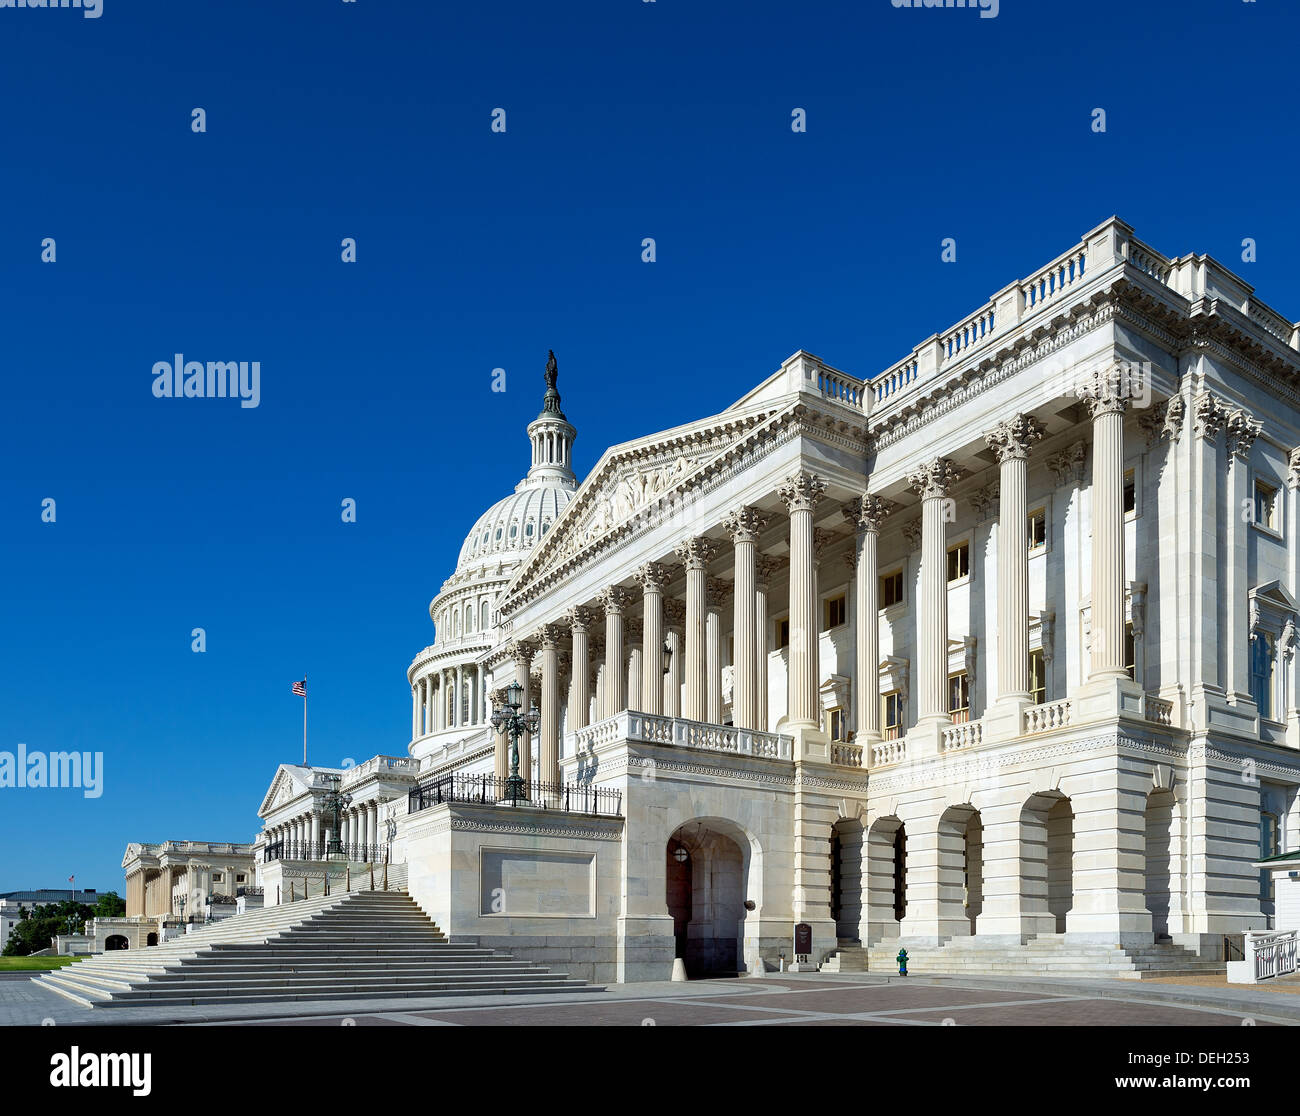 Die United States Capitol Building, Washington D.C., USA Stockbild